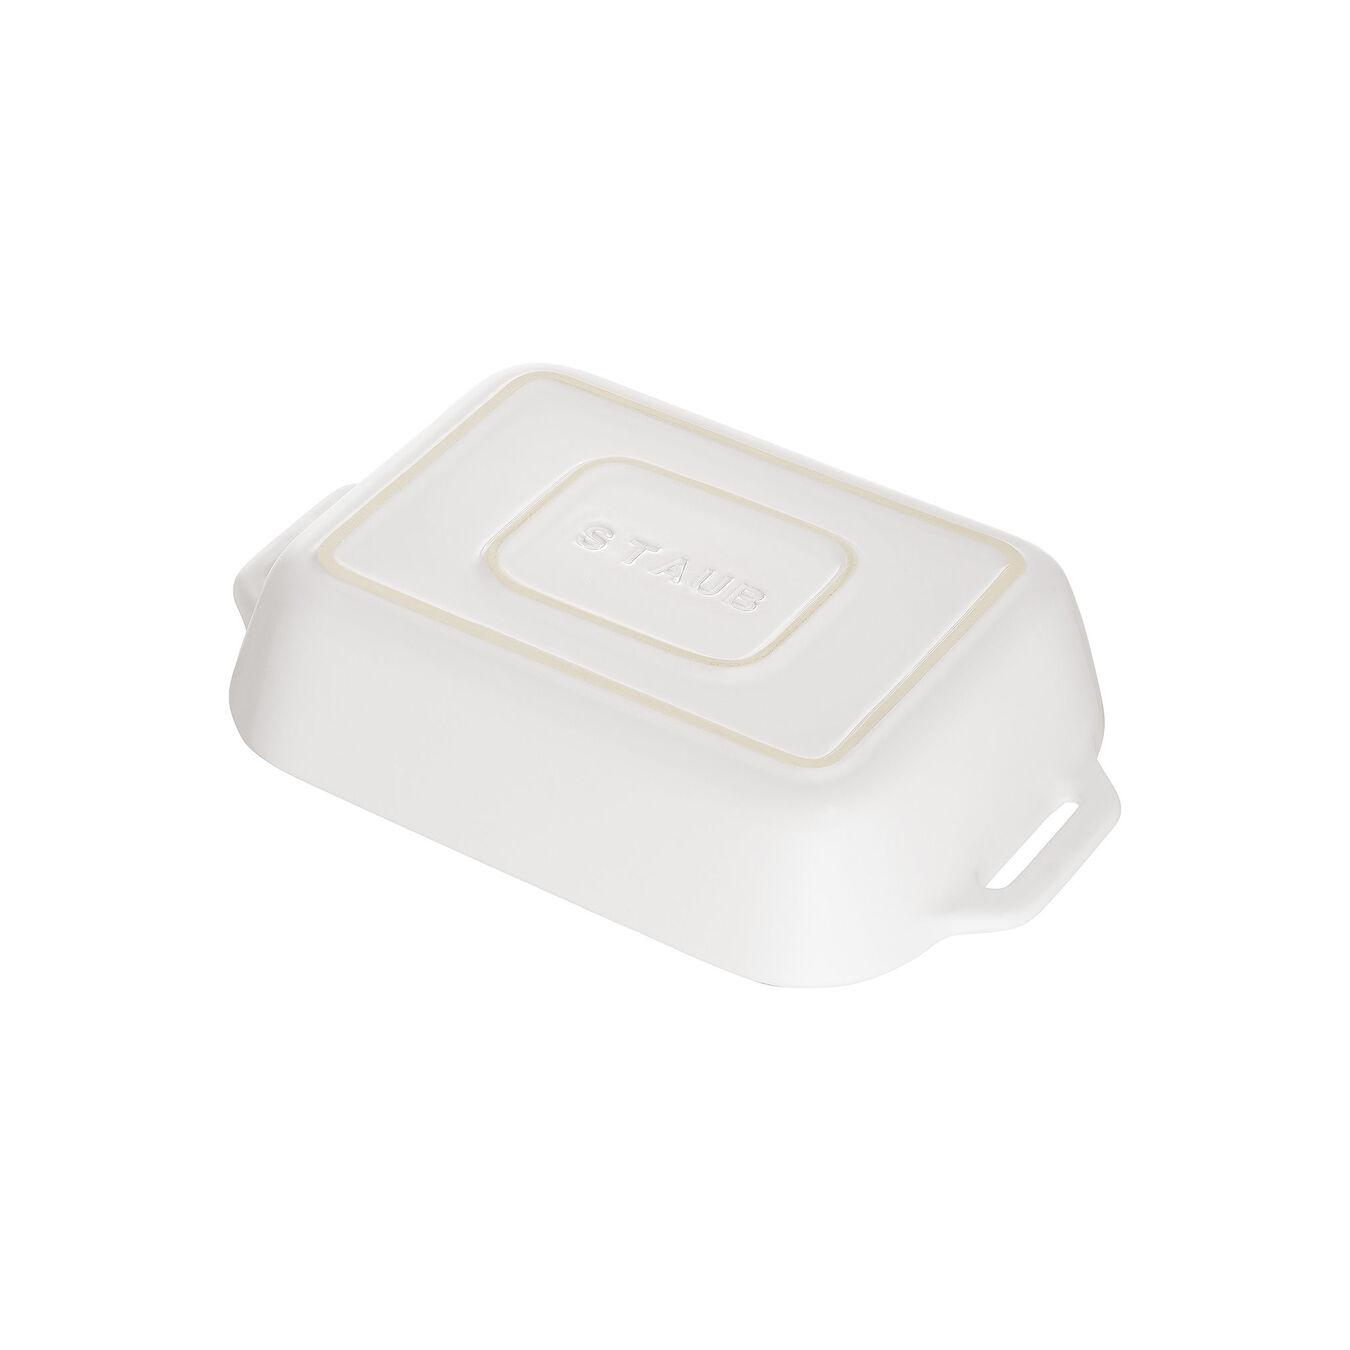 Ceramic rectangular Plat empilable, Pure-White,,large 3